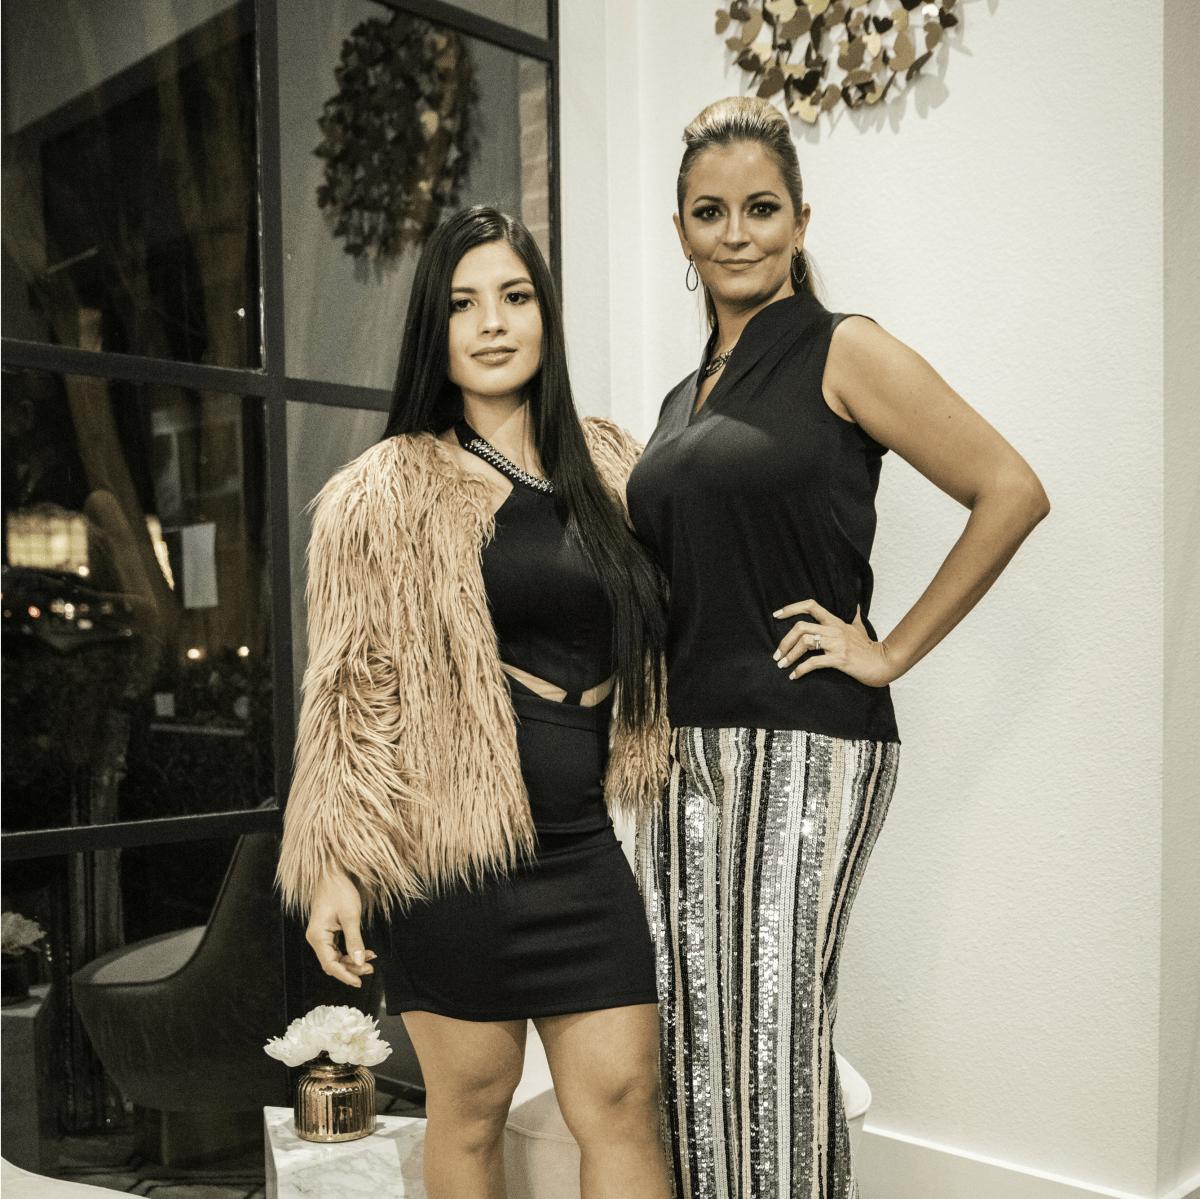 Karen Villareal, Karen Cuellar-Schmelzer